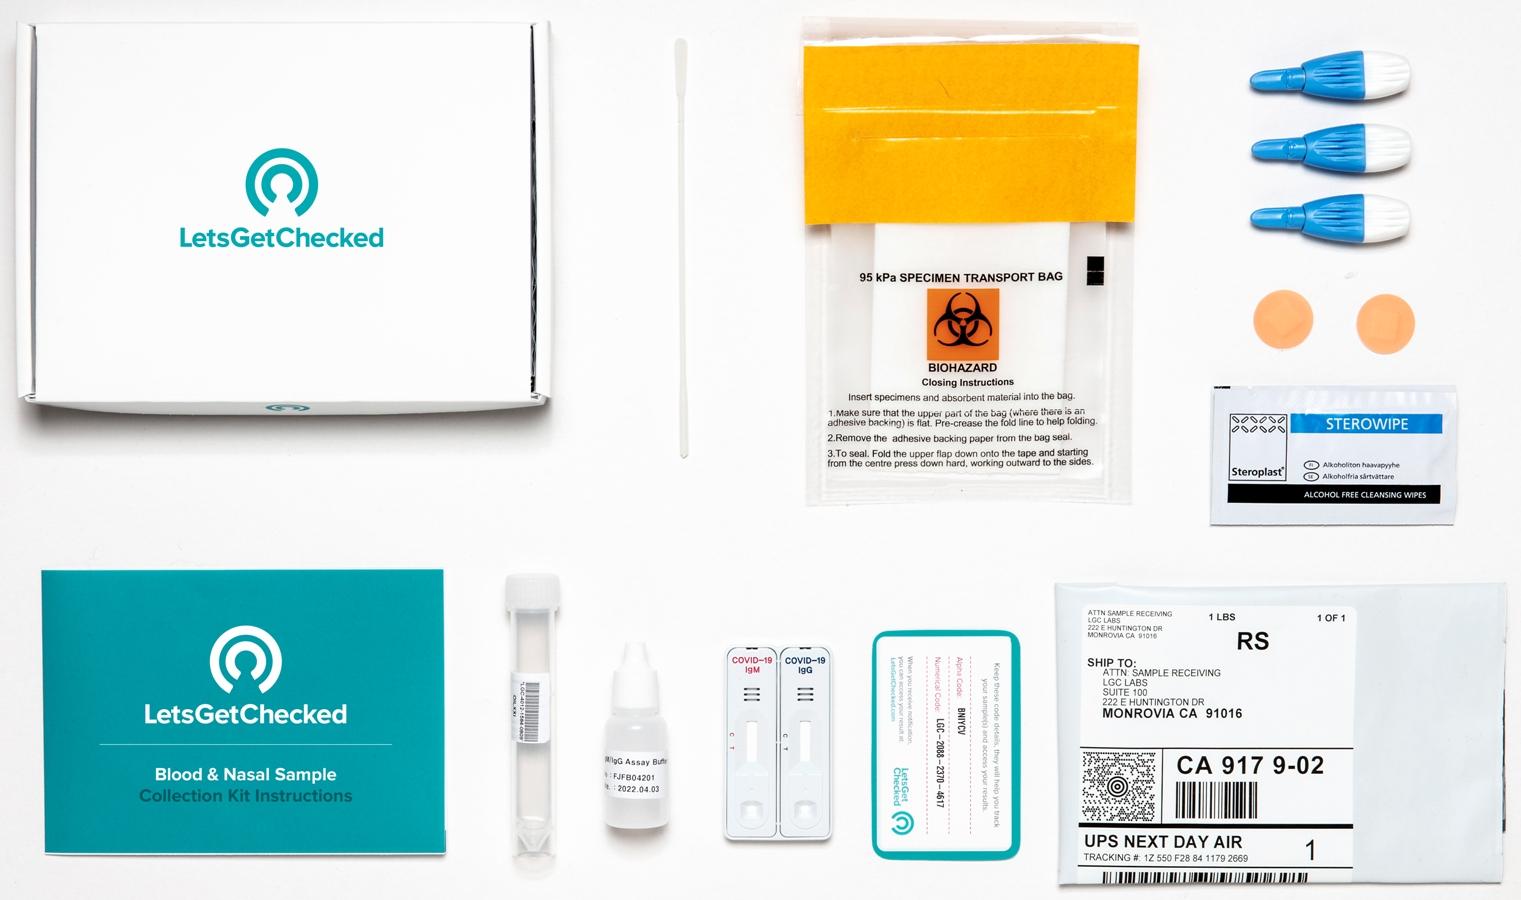 LetsGetChecked raises $71 million for at-home coronavirus test kits 5